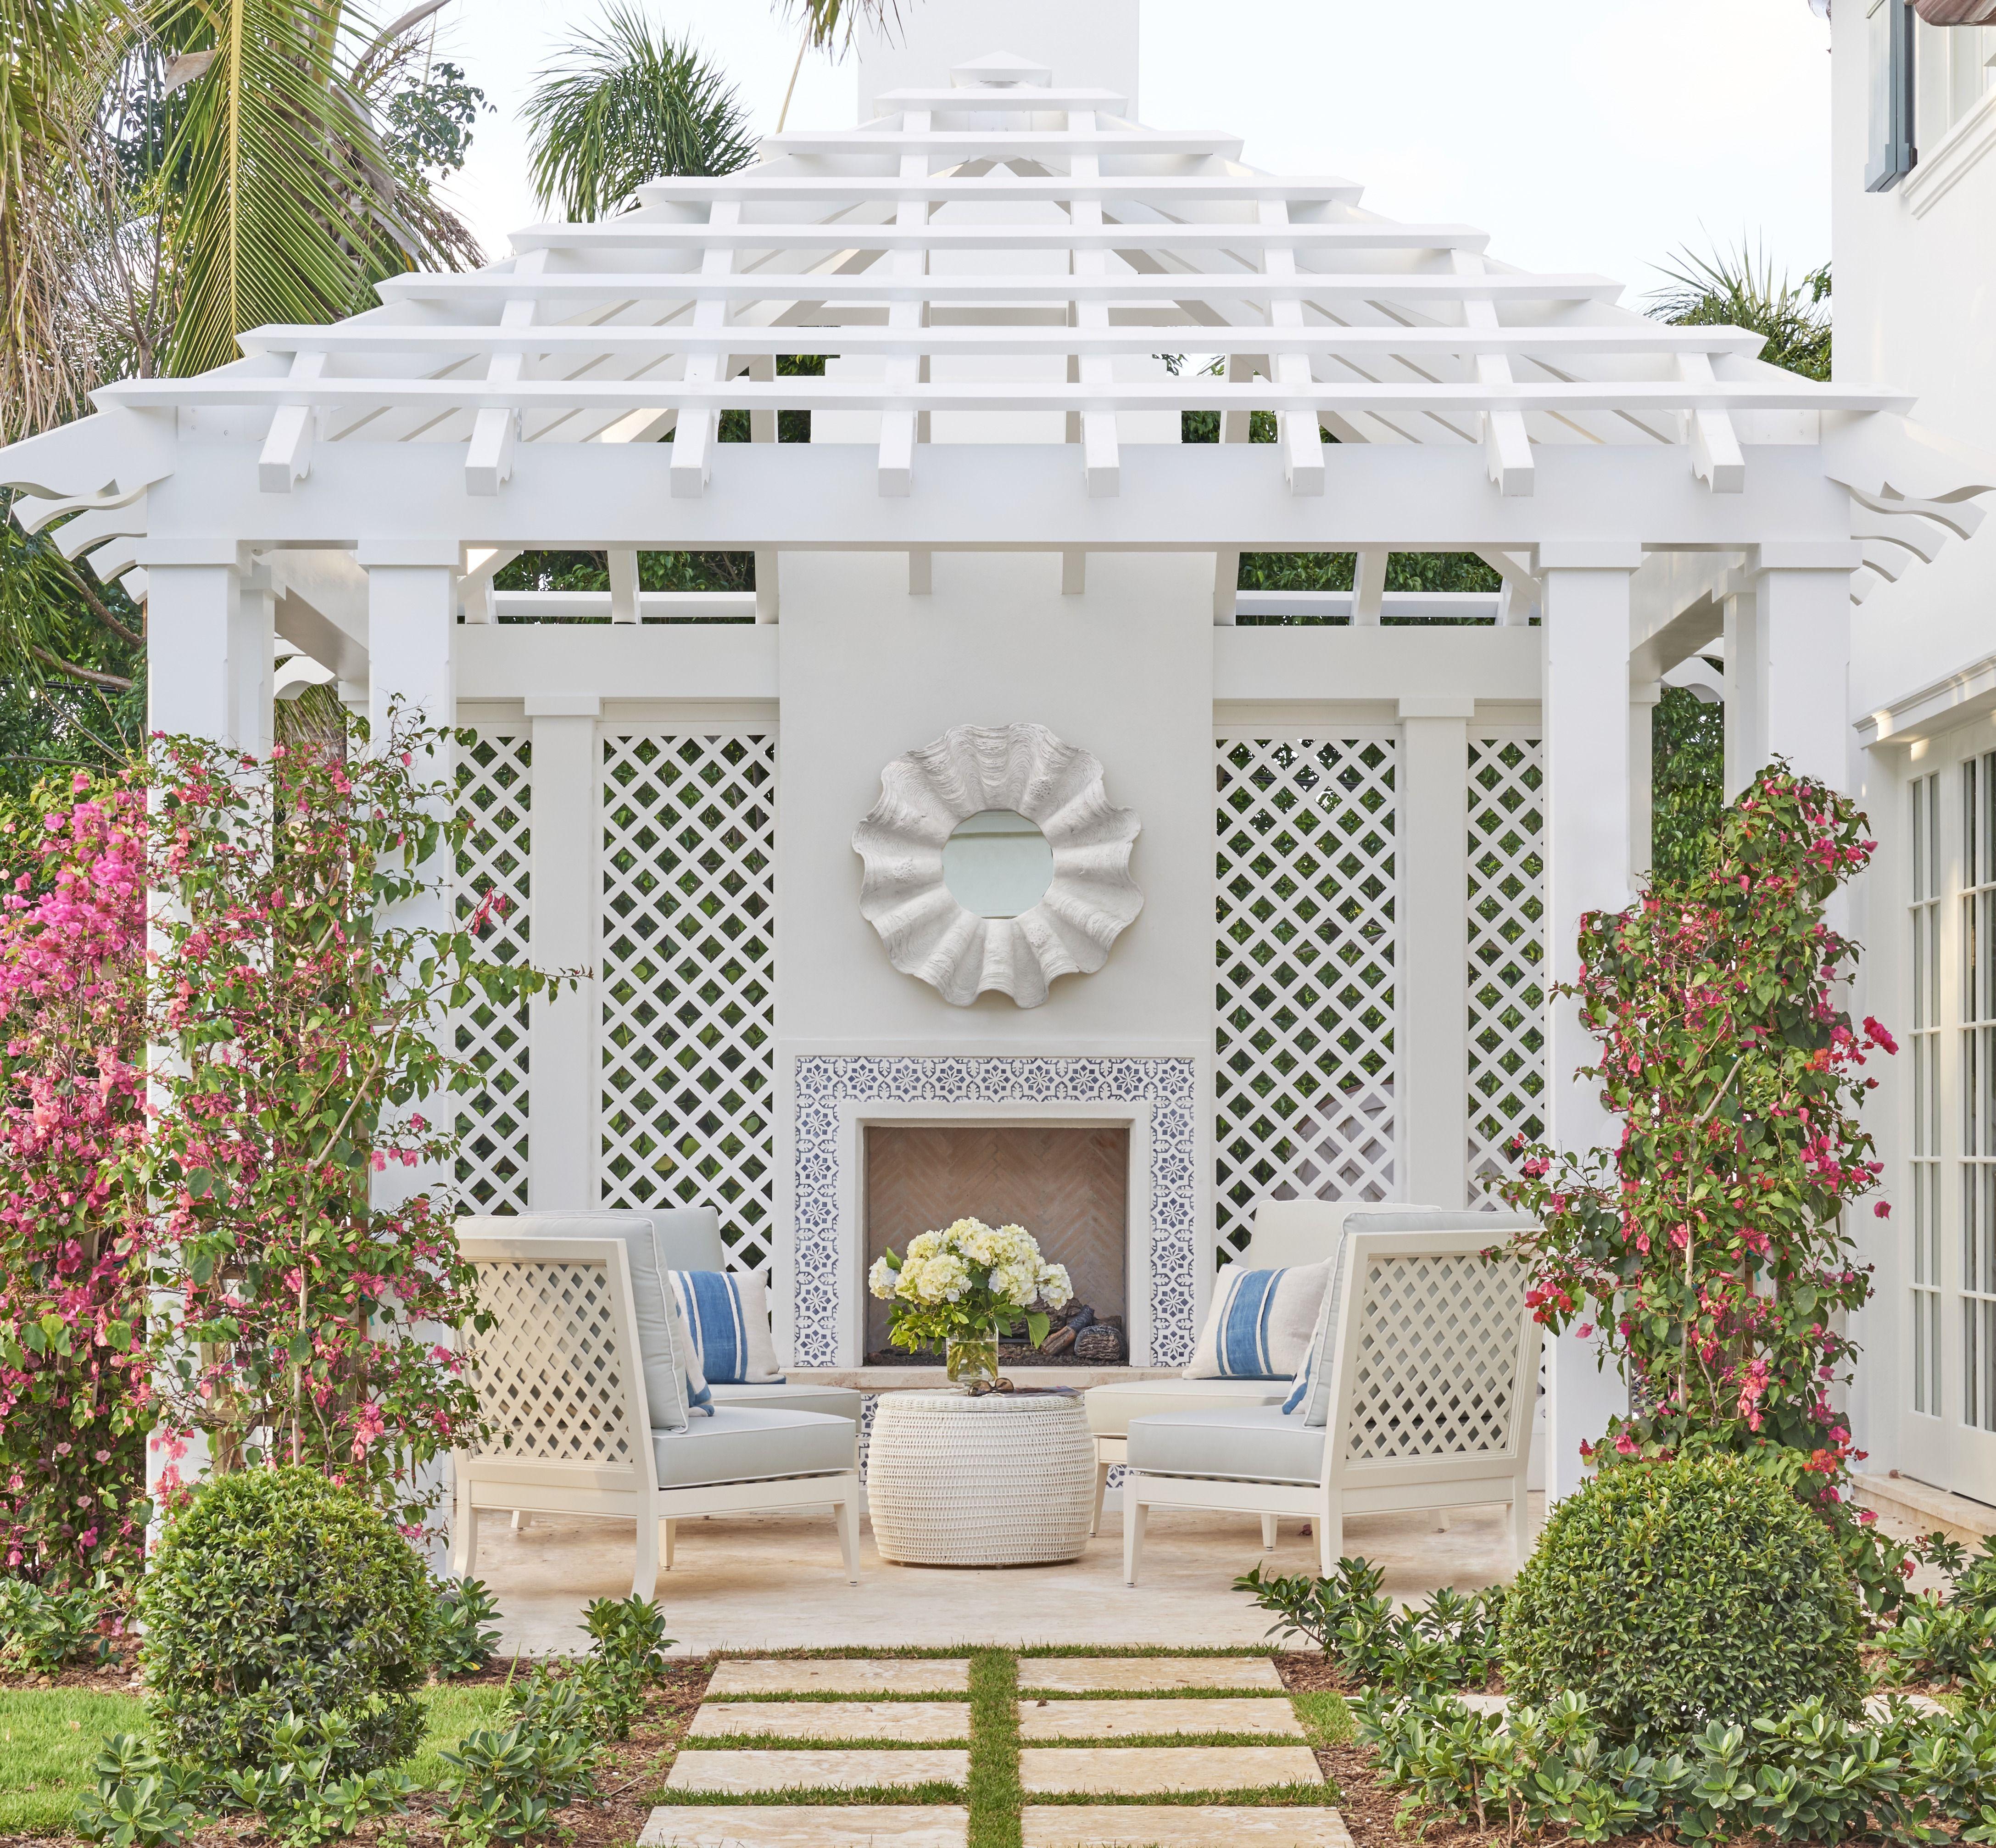 38 patio ideas for a beautiful backyard